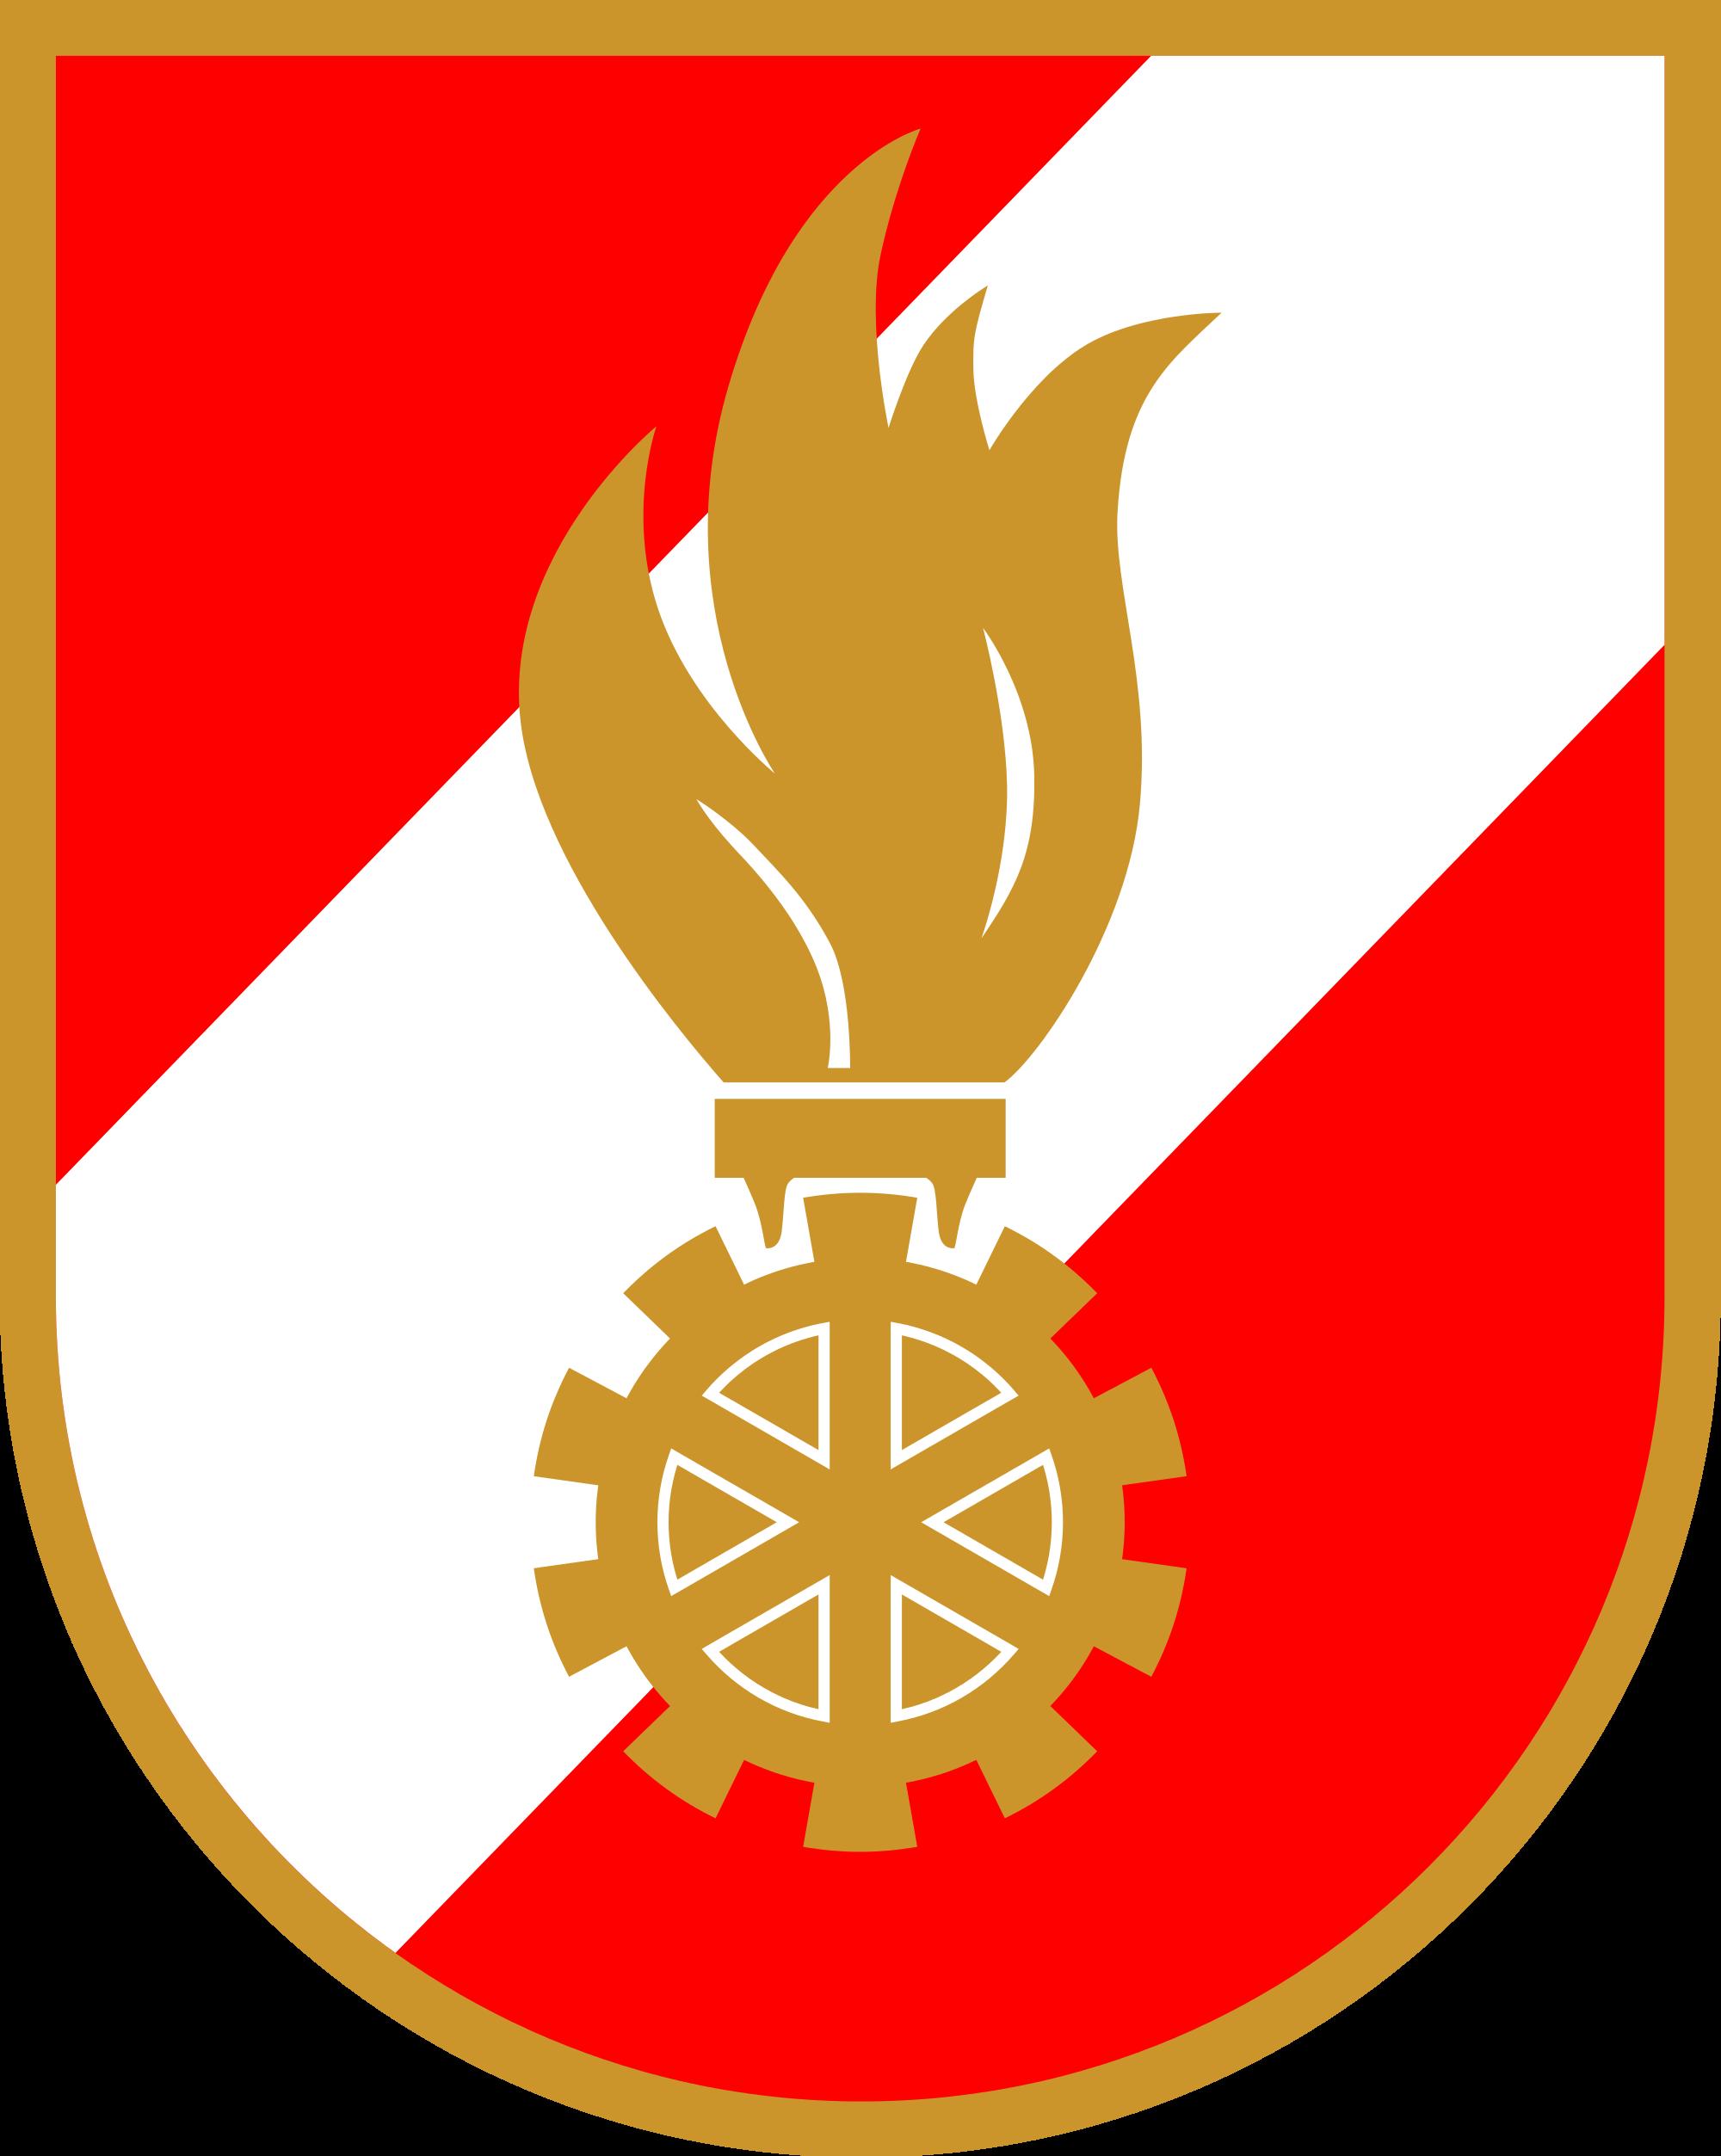 Freiwillige Feuerwehr Himmelberg